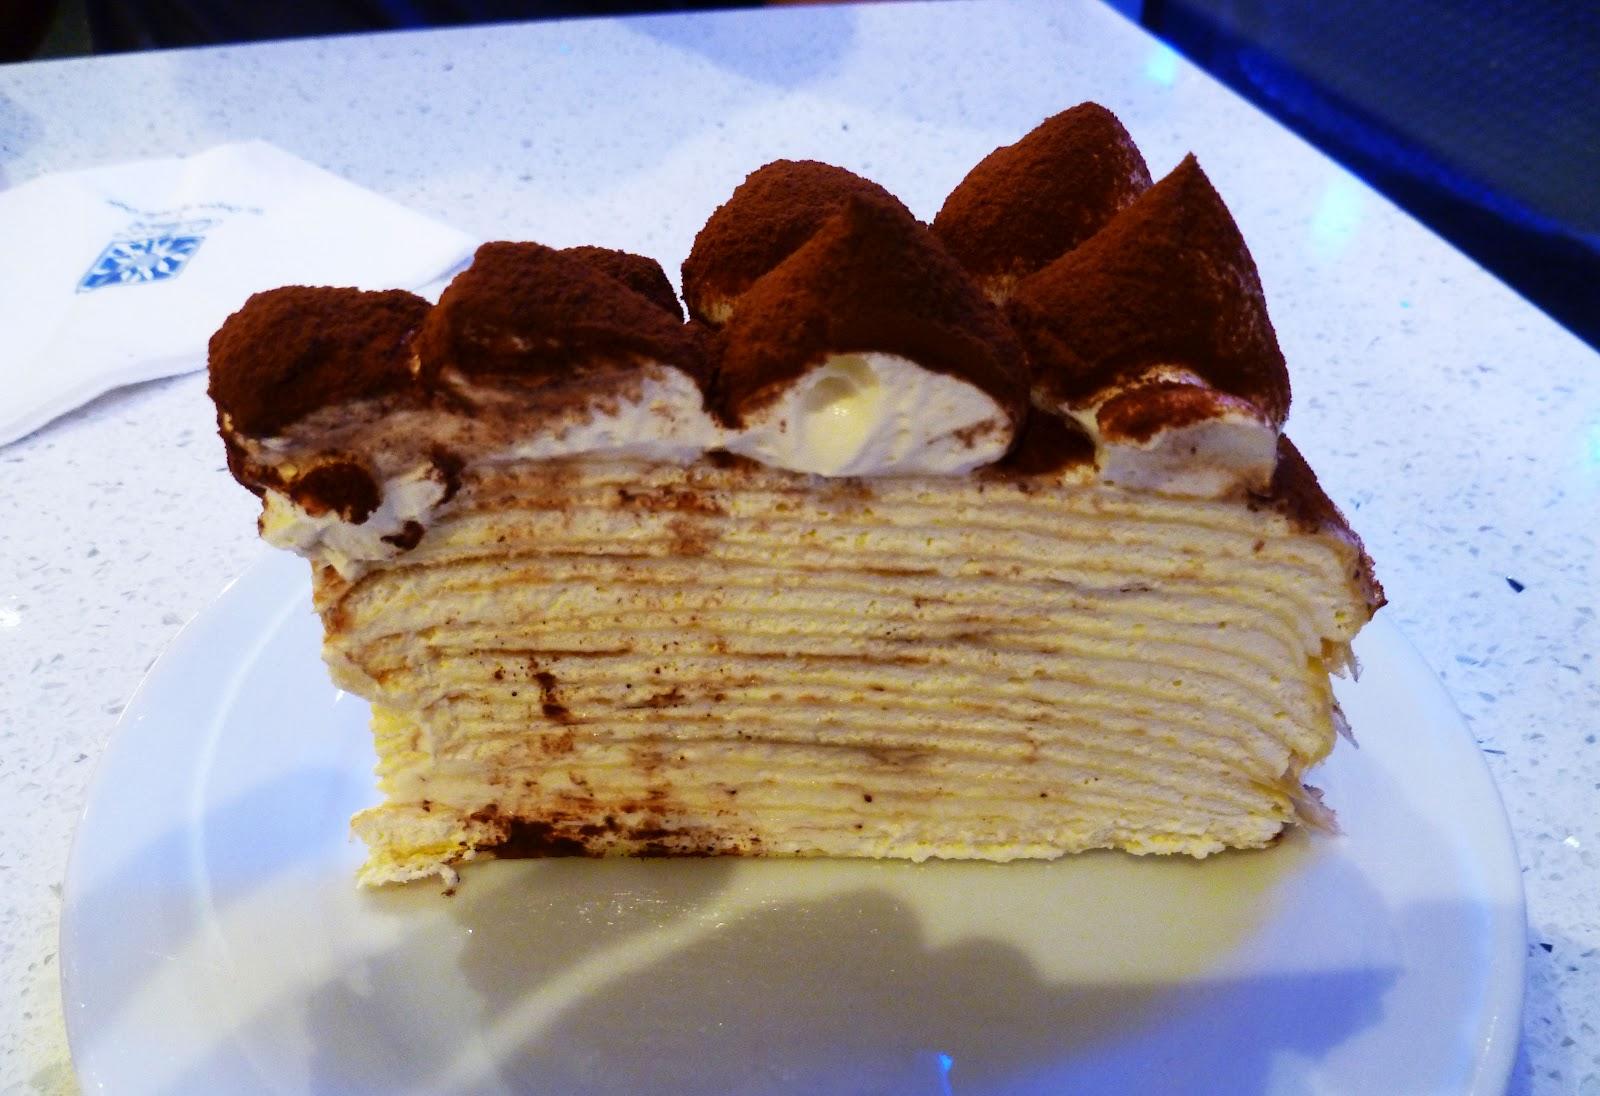 Tiramisu Mille Crepe Cake, Nadeje Patisserie | Confused Julia